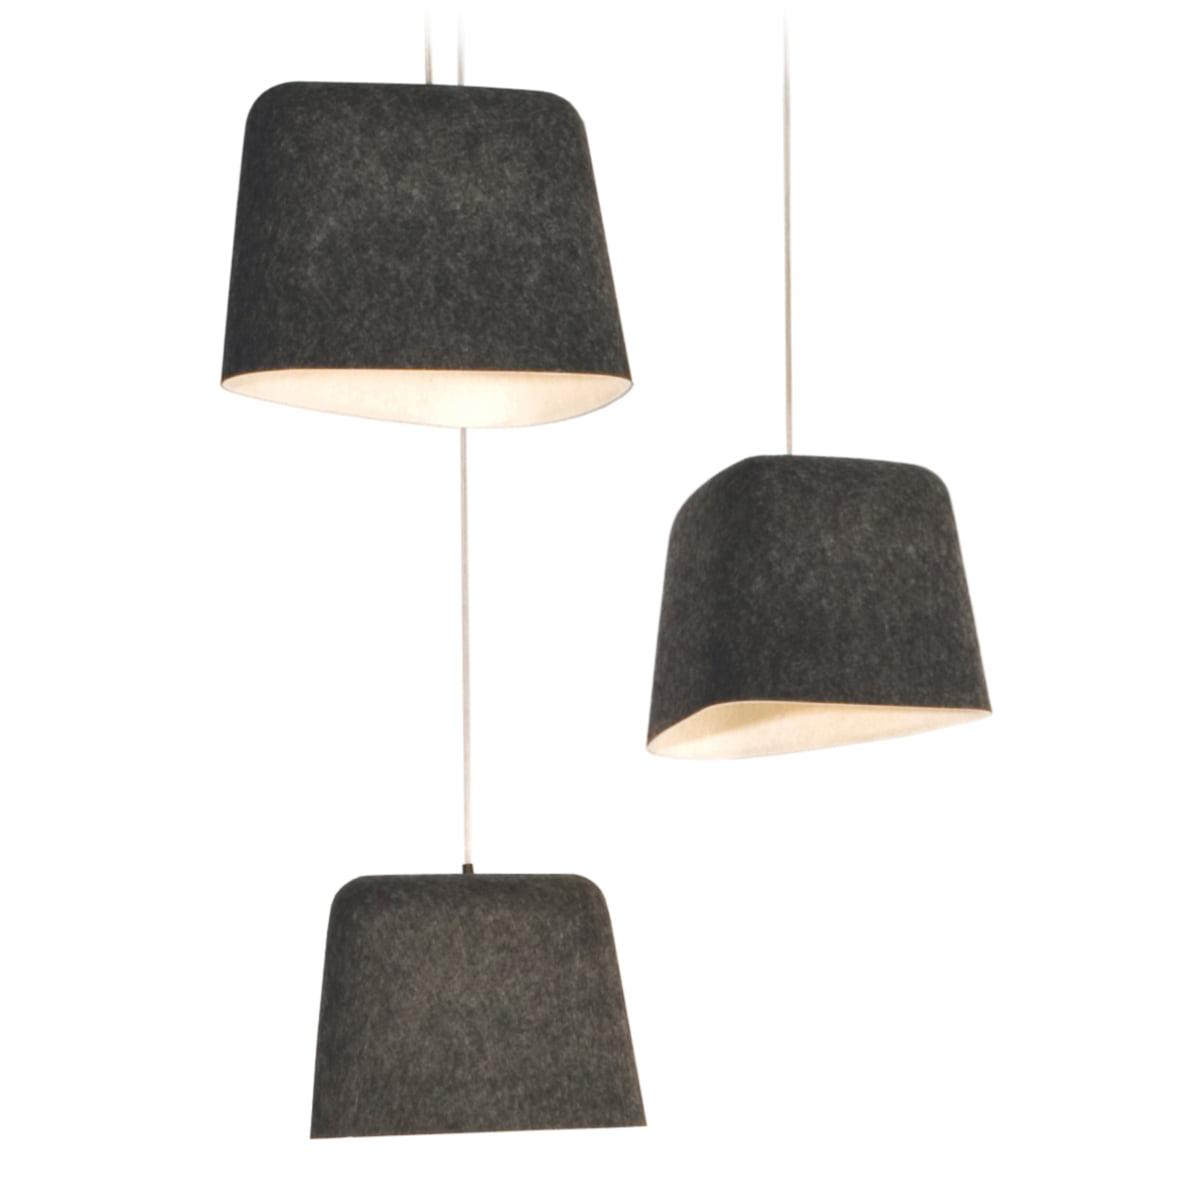 Felt shade pendant lamp by tom dixon tom dixon felt shade pendant lamp aloadofball Images